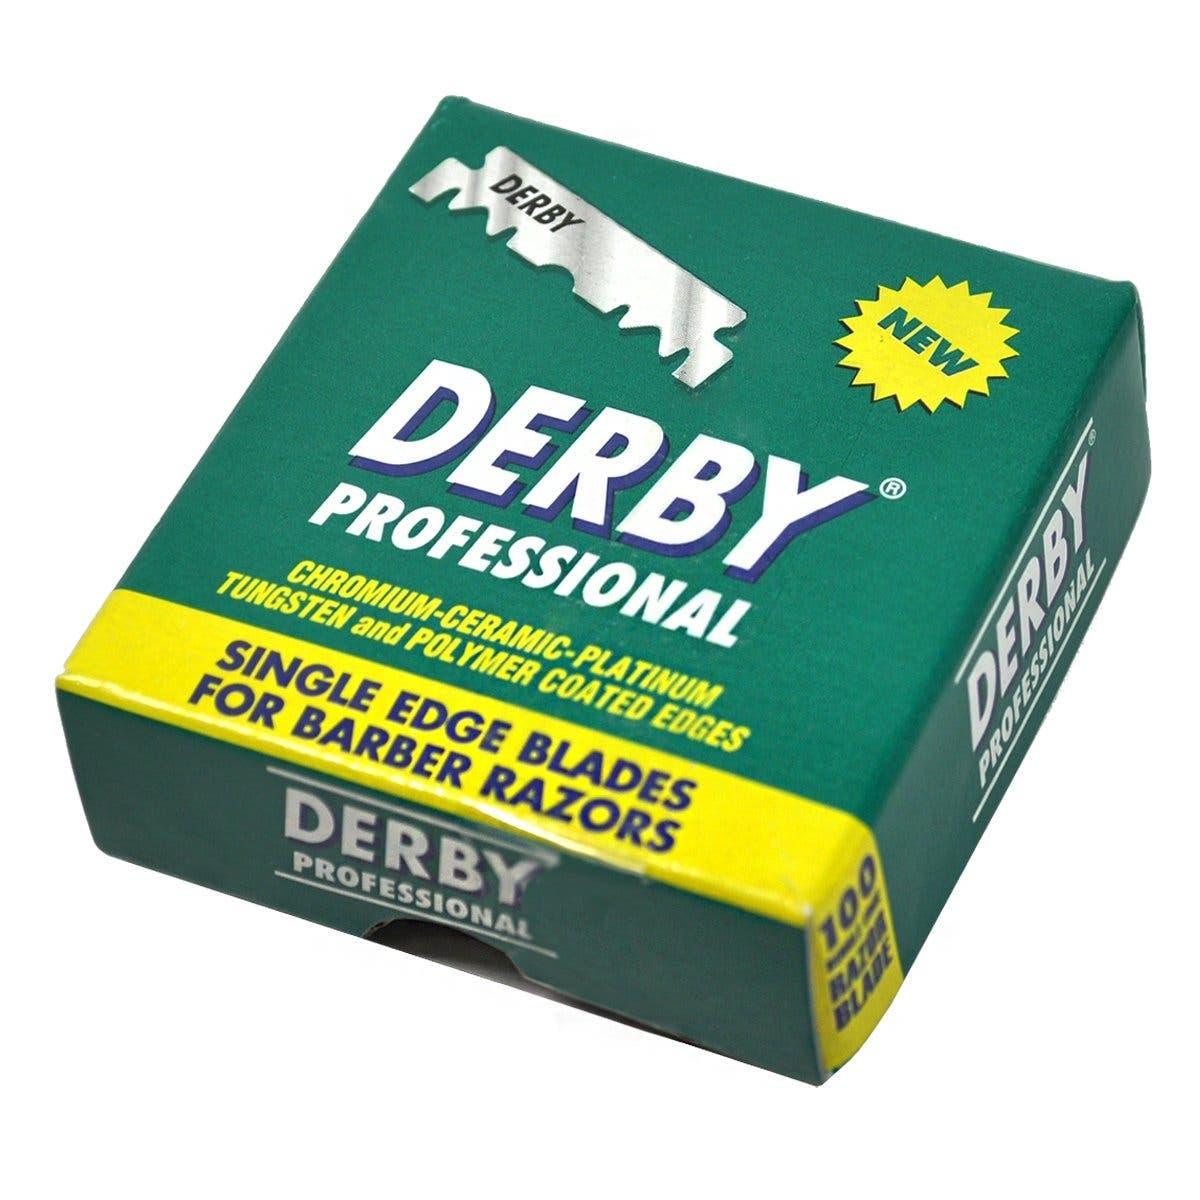 Derby Professional Single Edge Razor Blades (100pk)